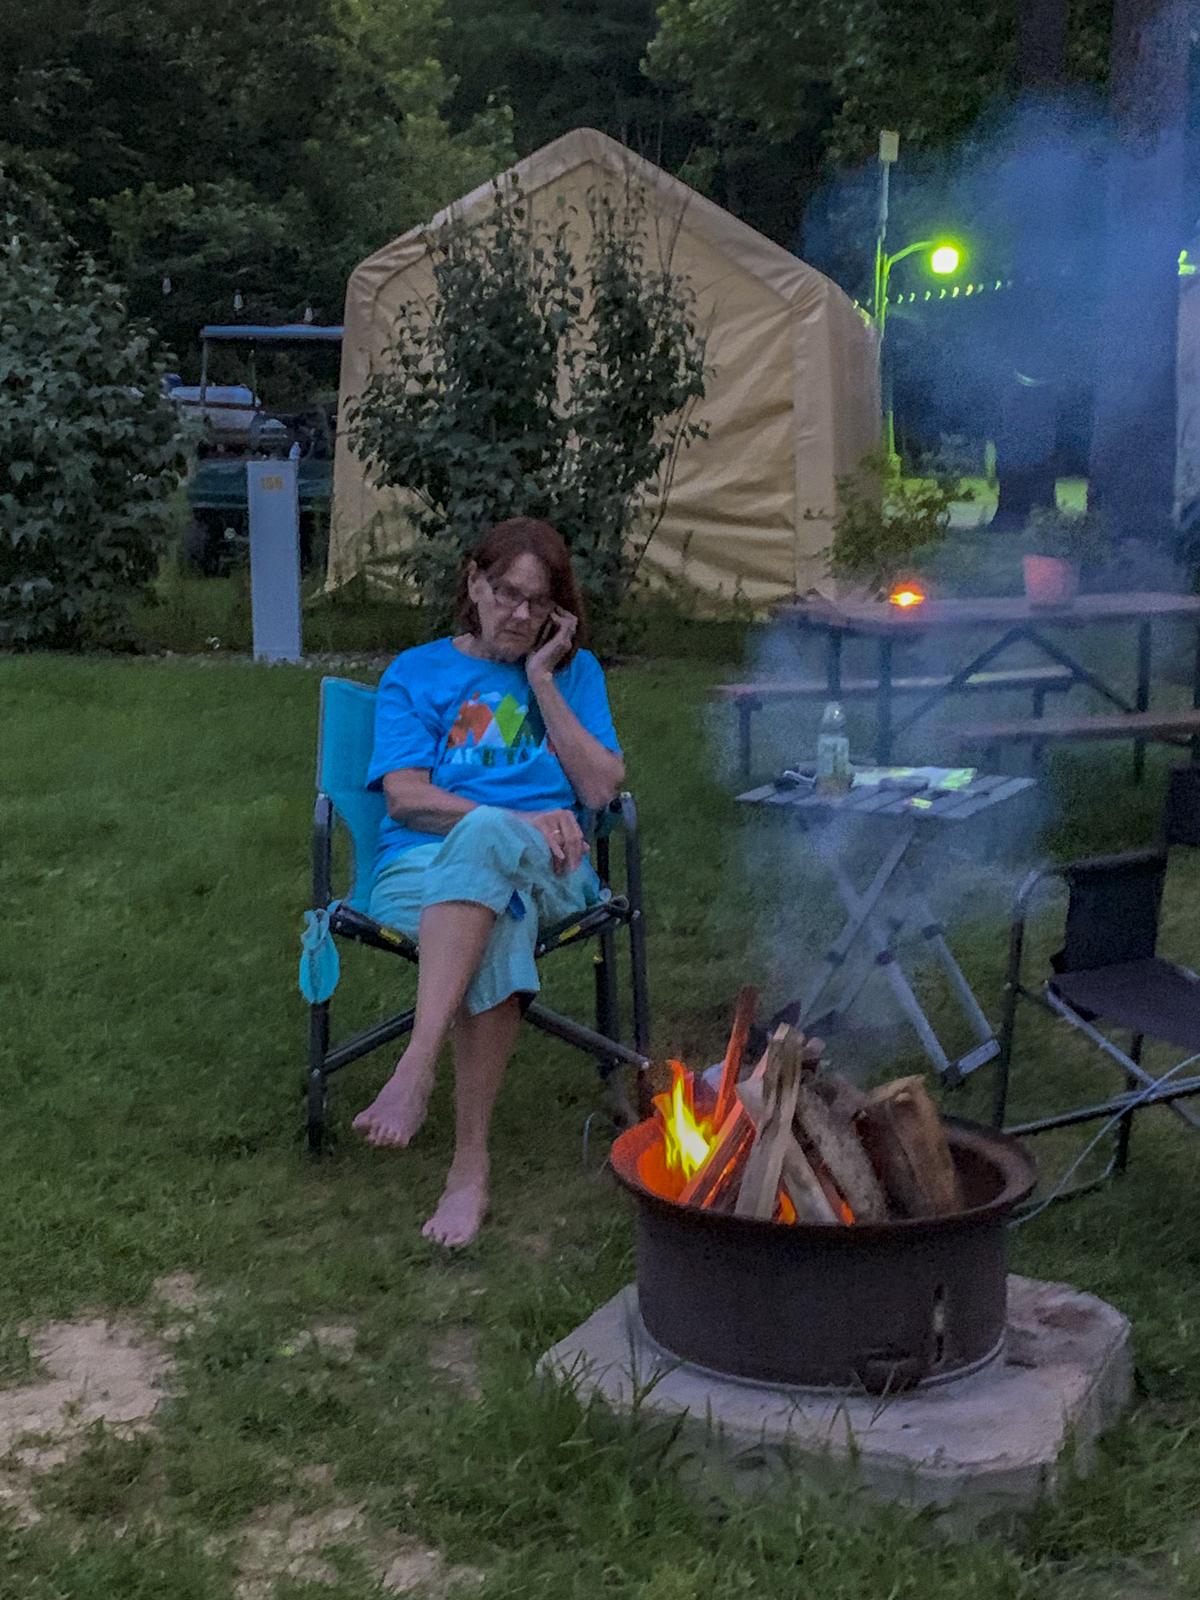 Camping in Pajamas